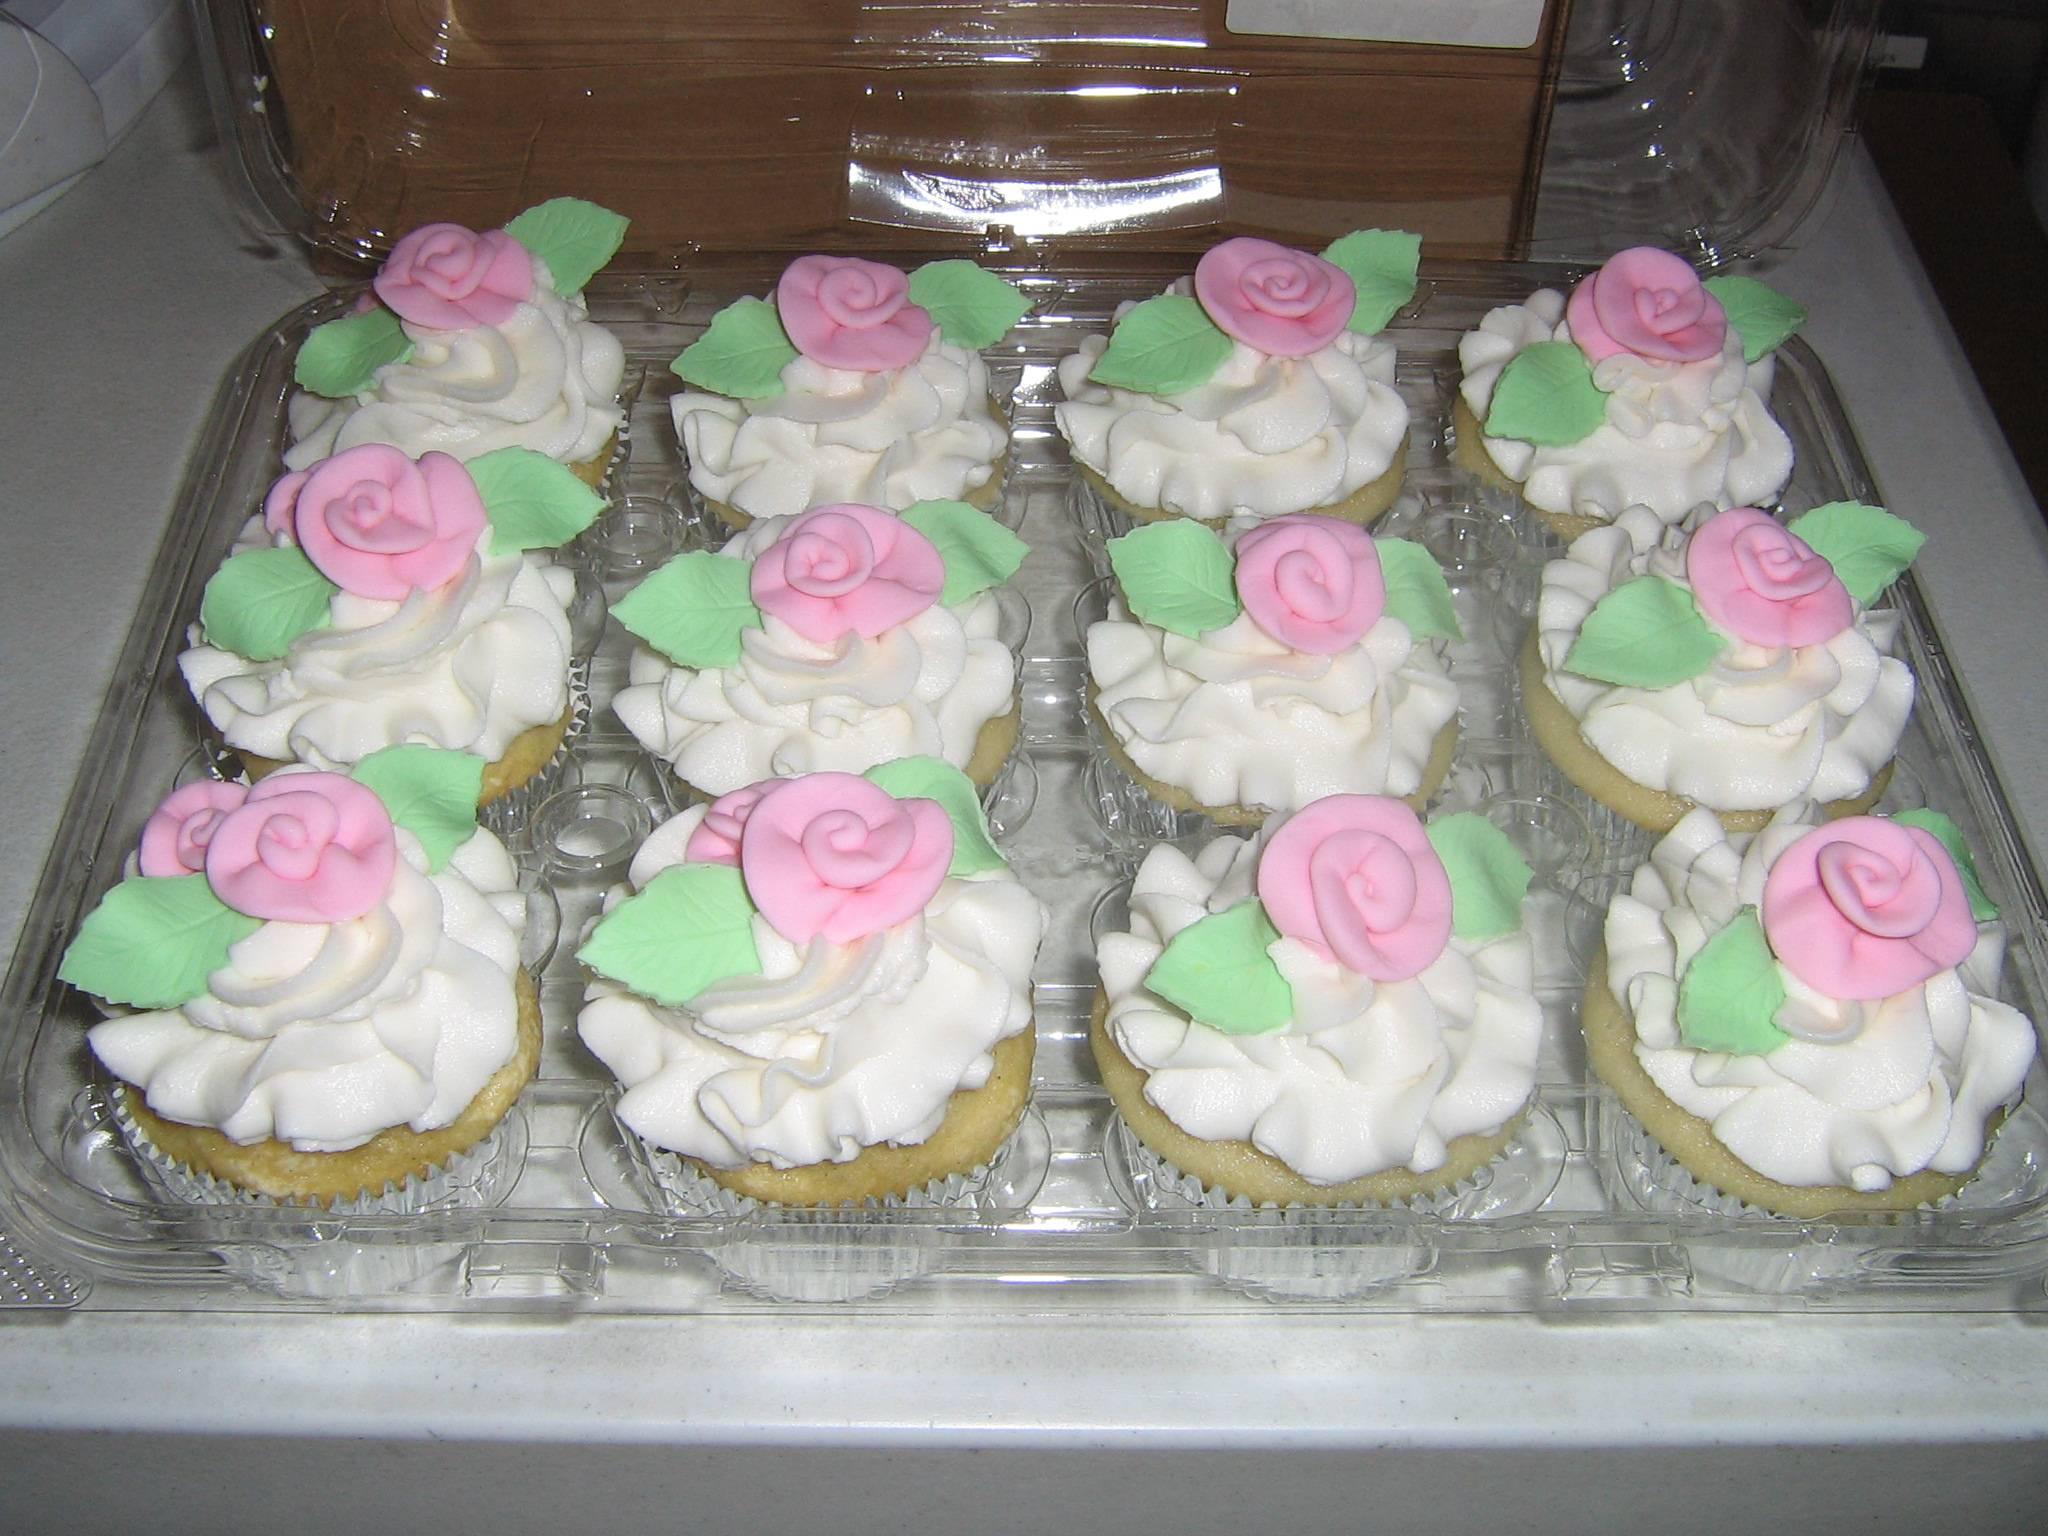 Gluten/Dairy Free Cupcakes